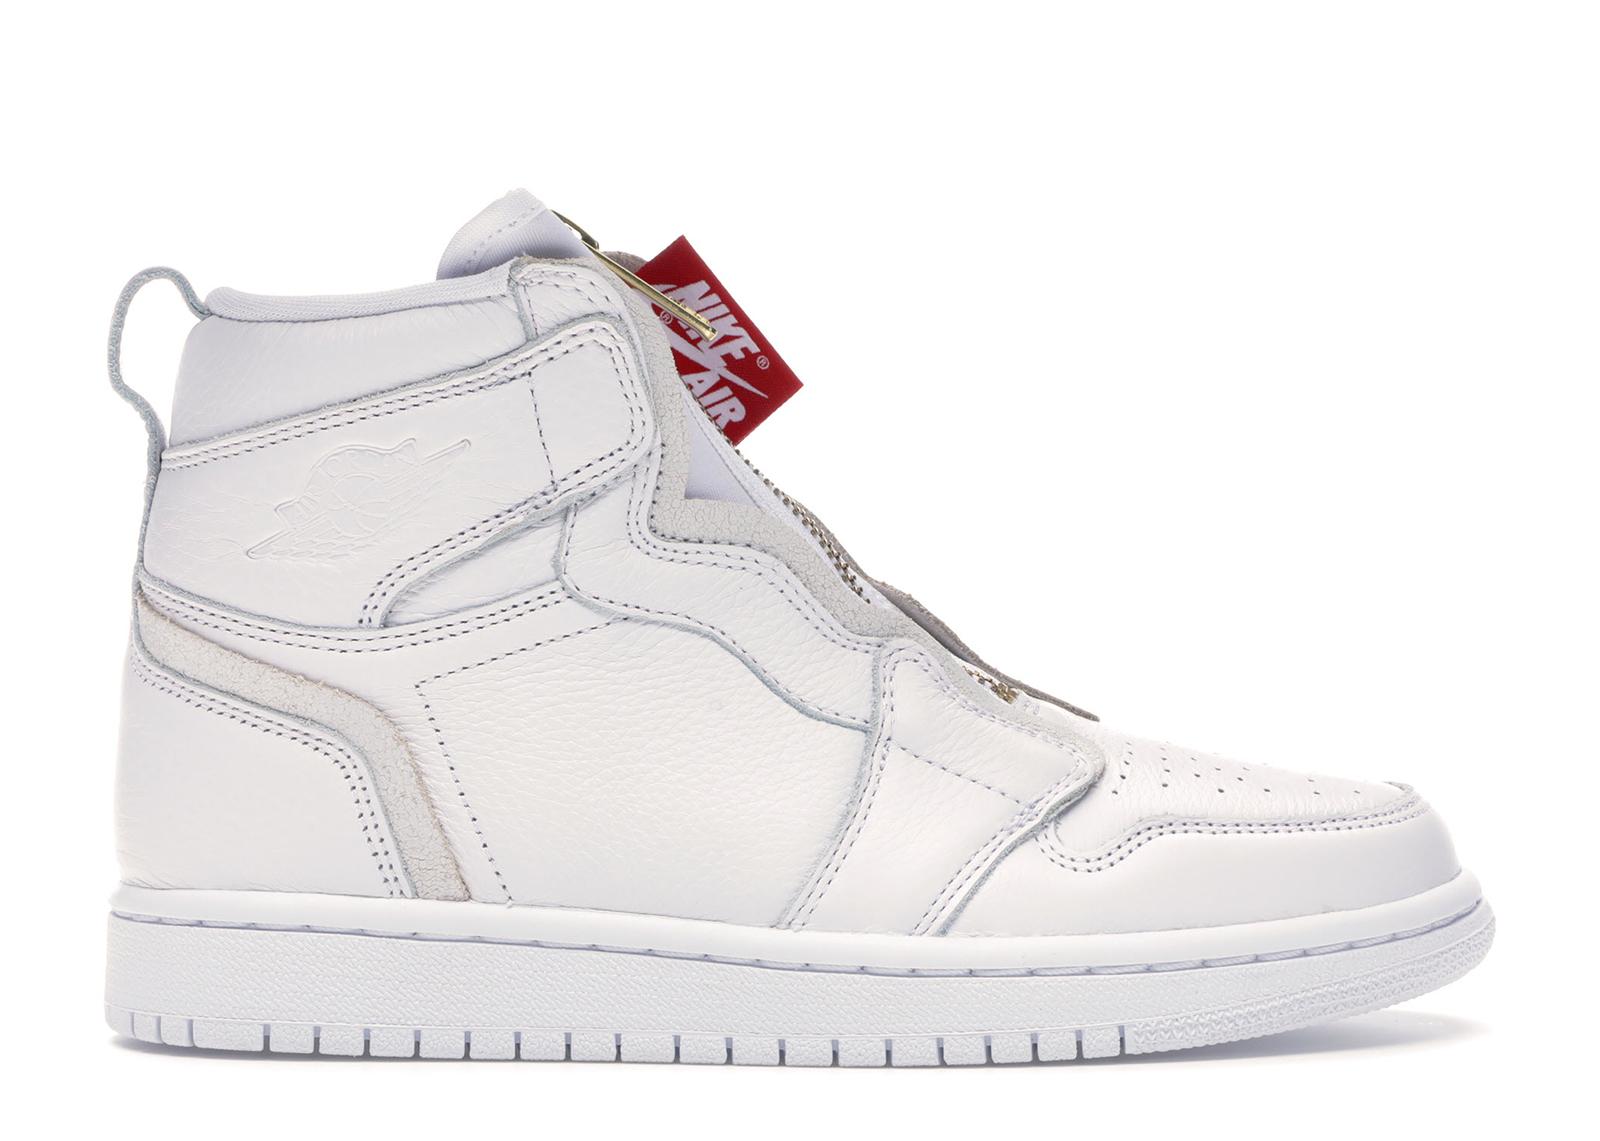 Jordan 1 Retro High Zip White (W